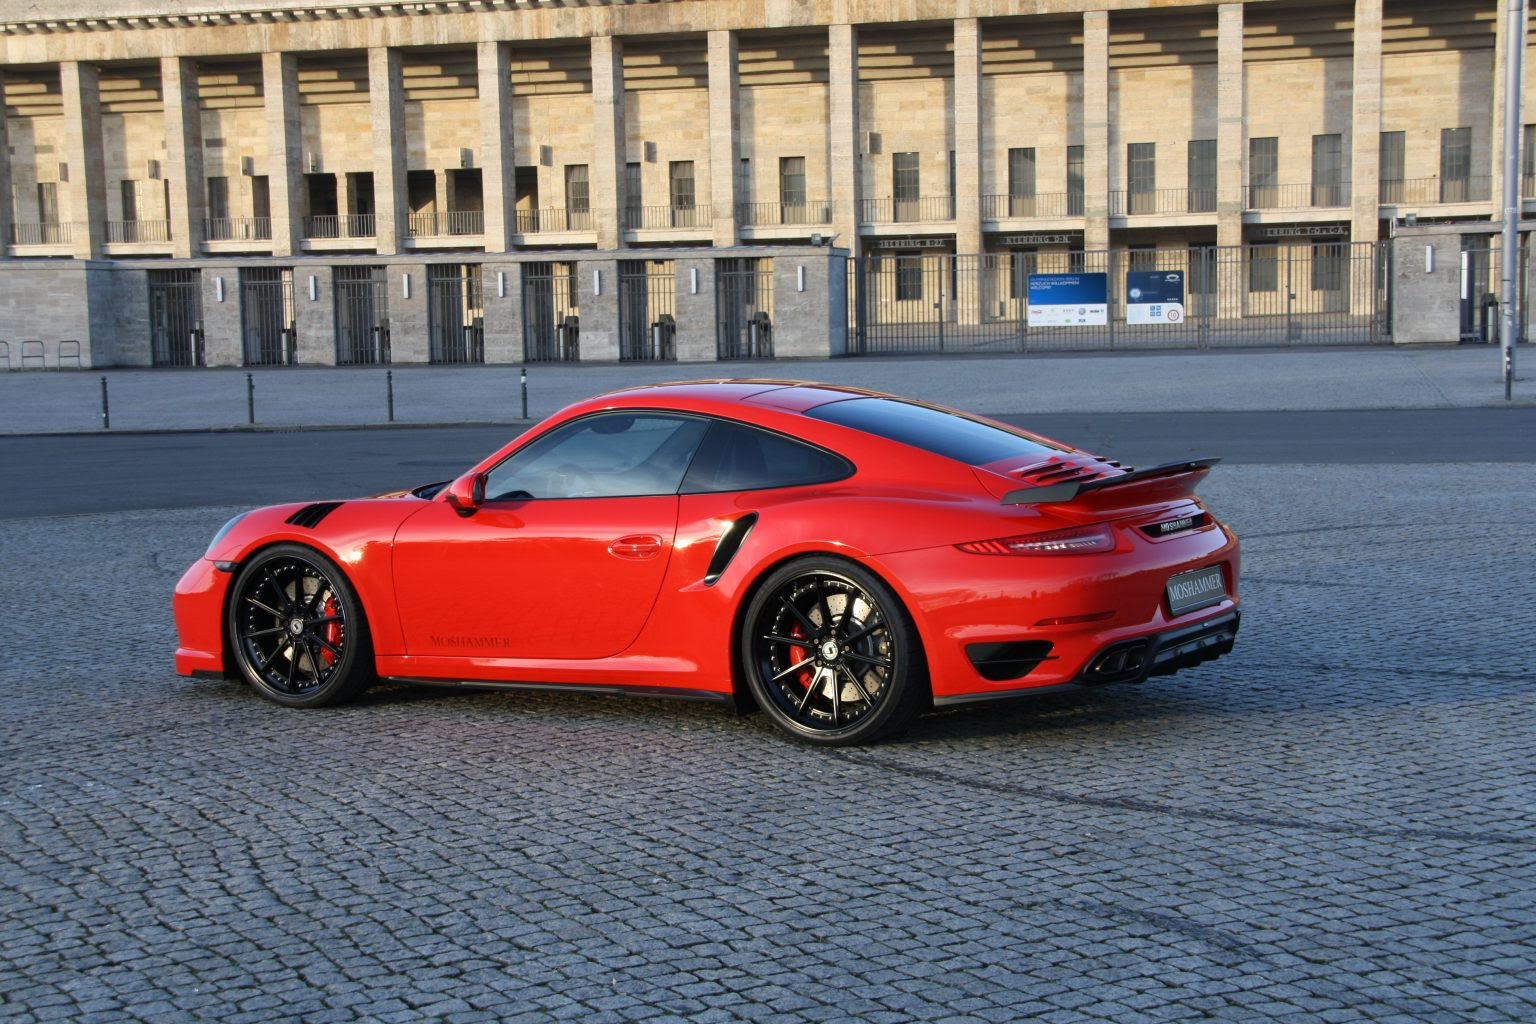 Radinox Wheels For The Moshammer Porsche Turbo Schmidt Wheels